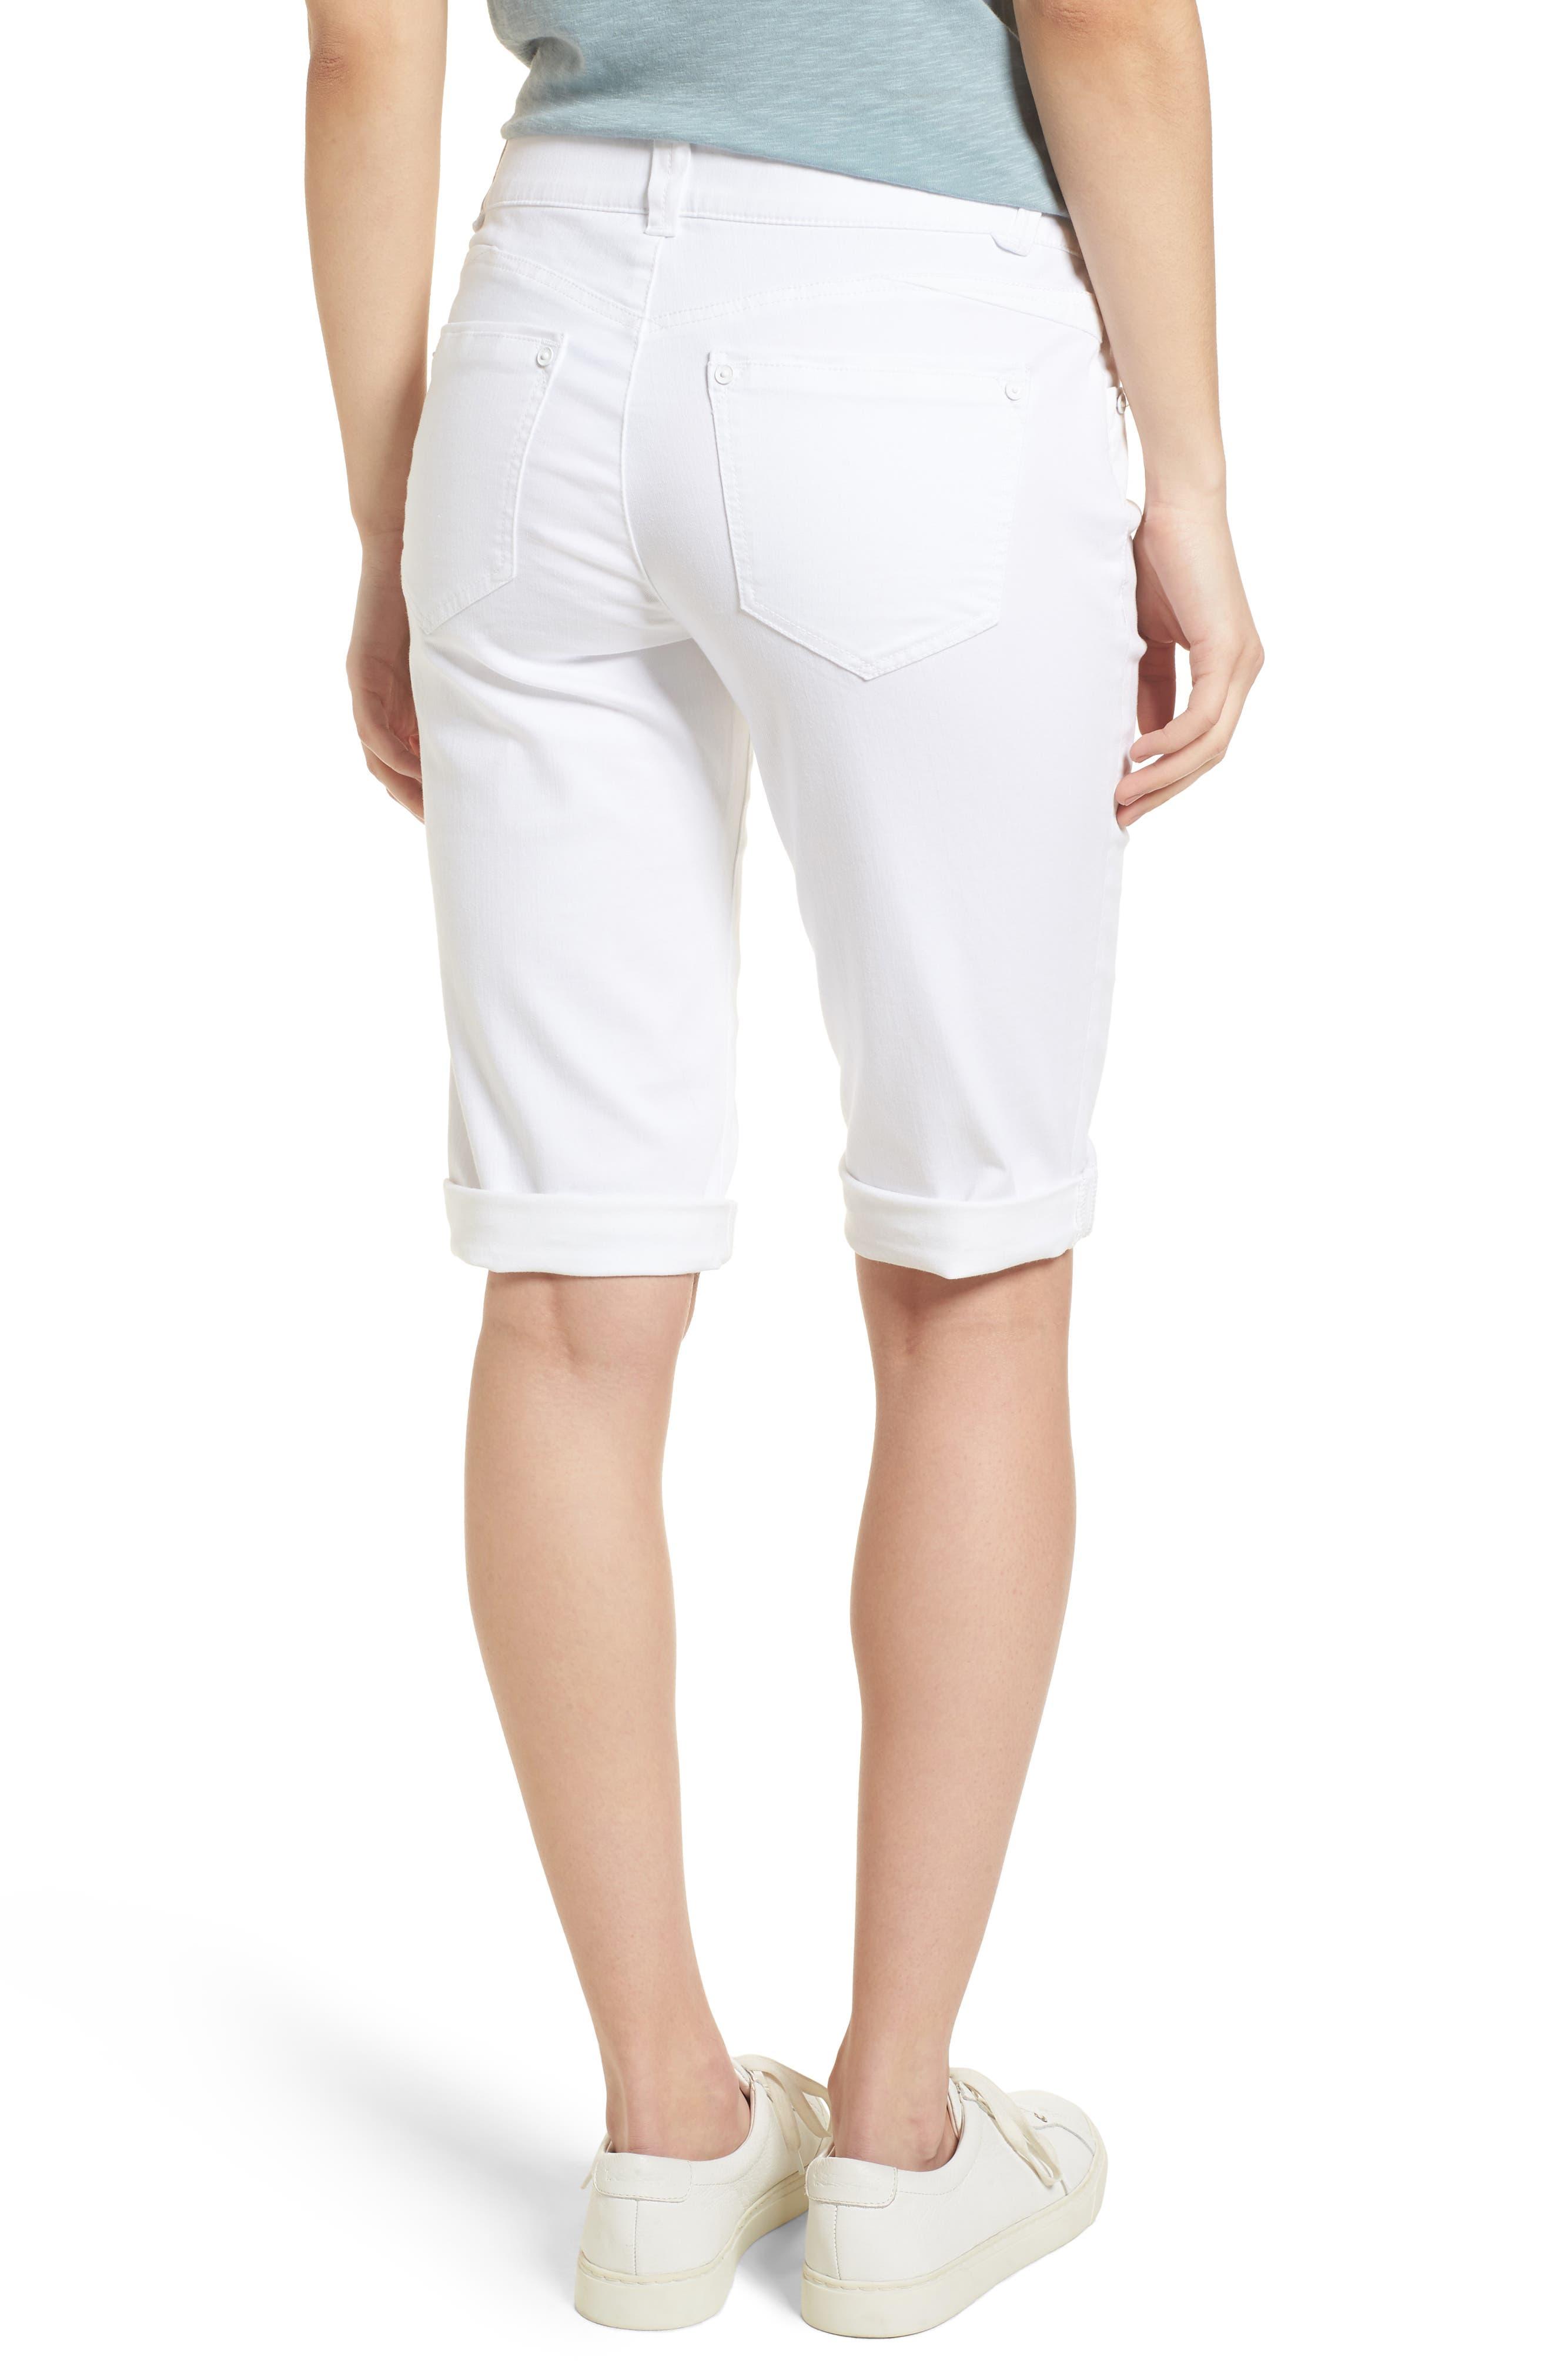 Ab-solution White Bermuda Shorts,                             Alternate thumbnail 2, color,                             106